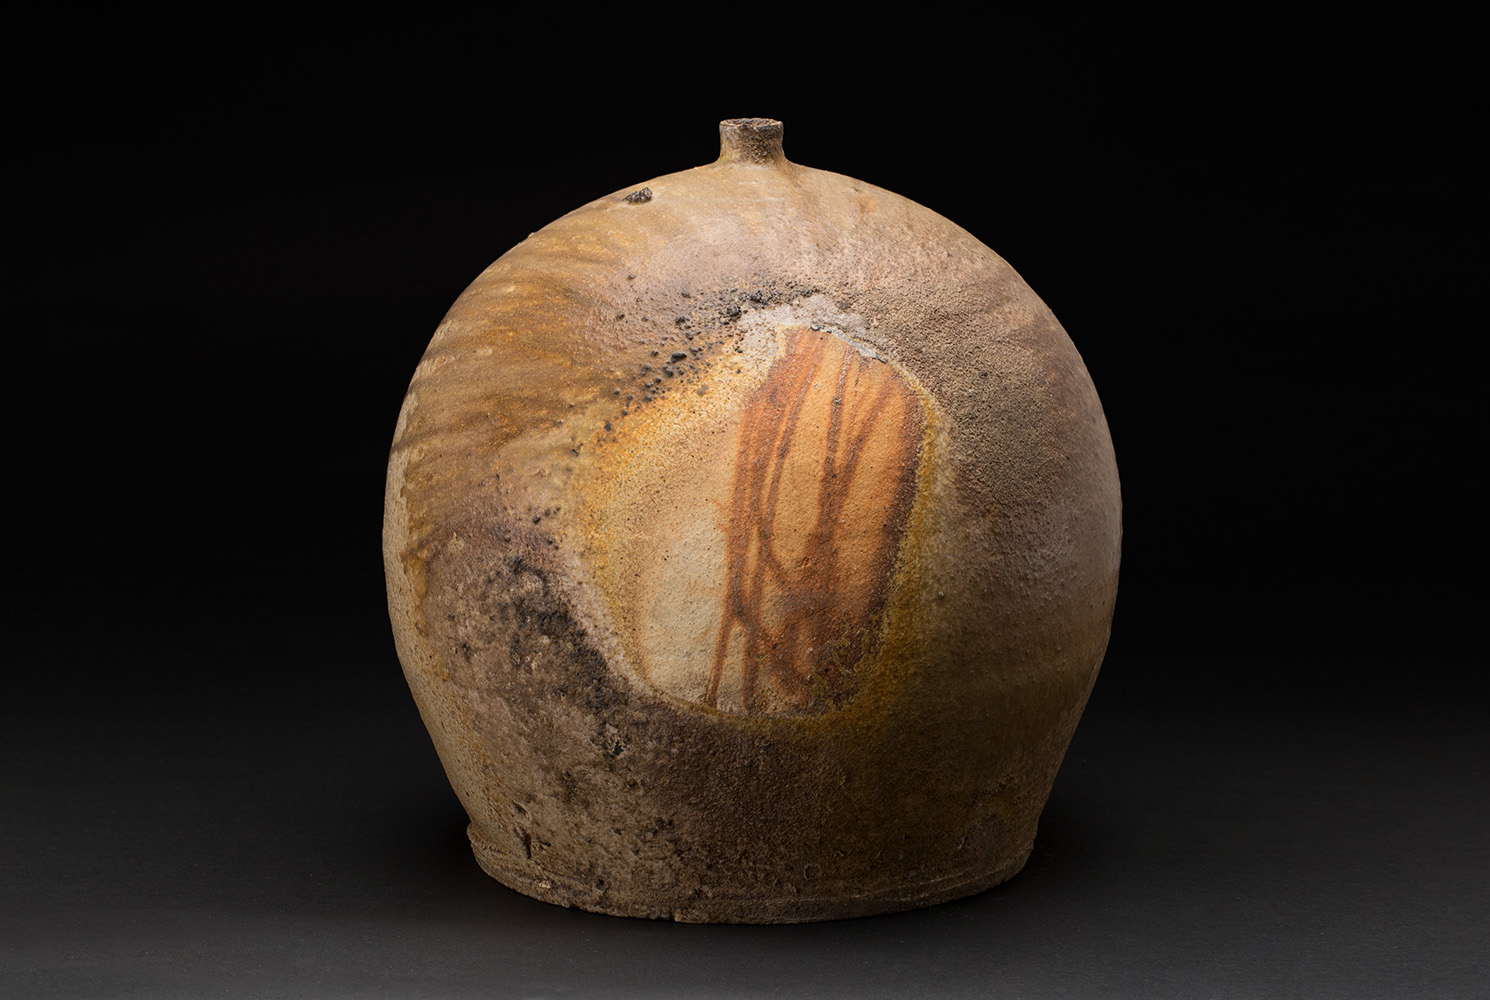 Jeff Shapiro  Large Bizen Tsubo  , 2005 Woodfired Ceramic 13 x 12.5 x 12.5 inches 33 x 31.8 x 31.8 cm JSh 8